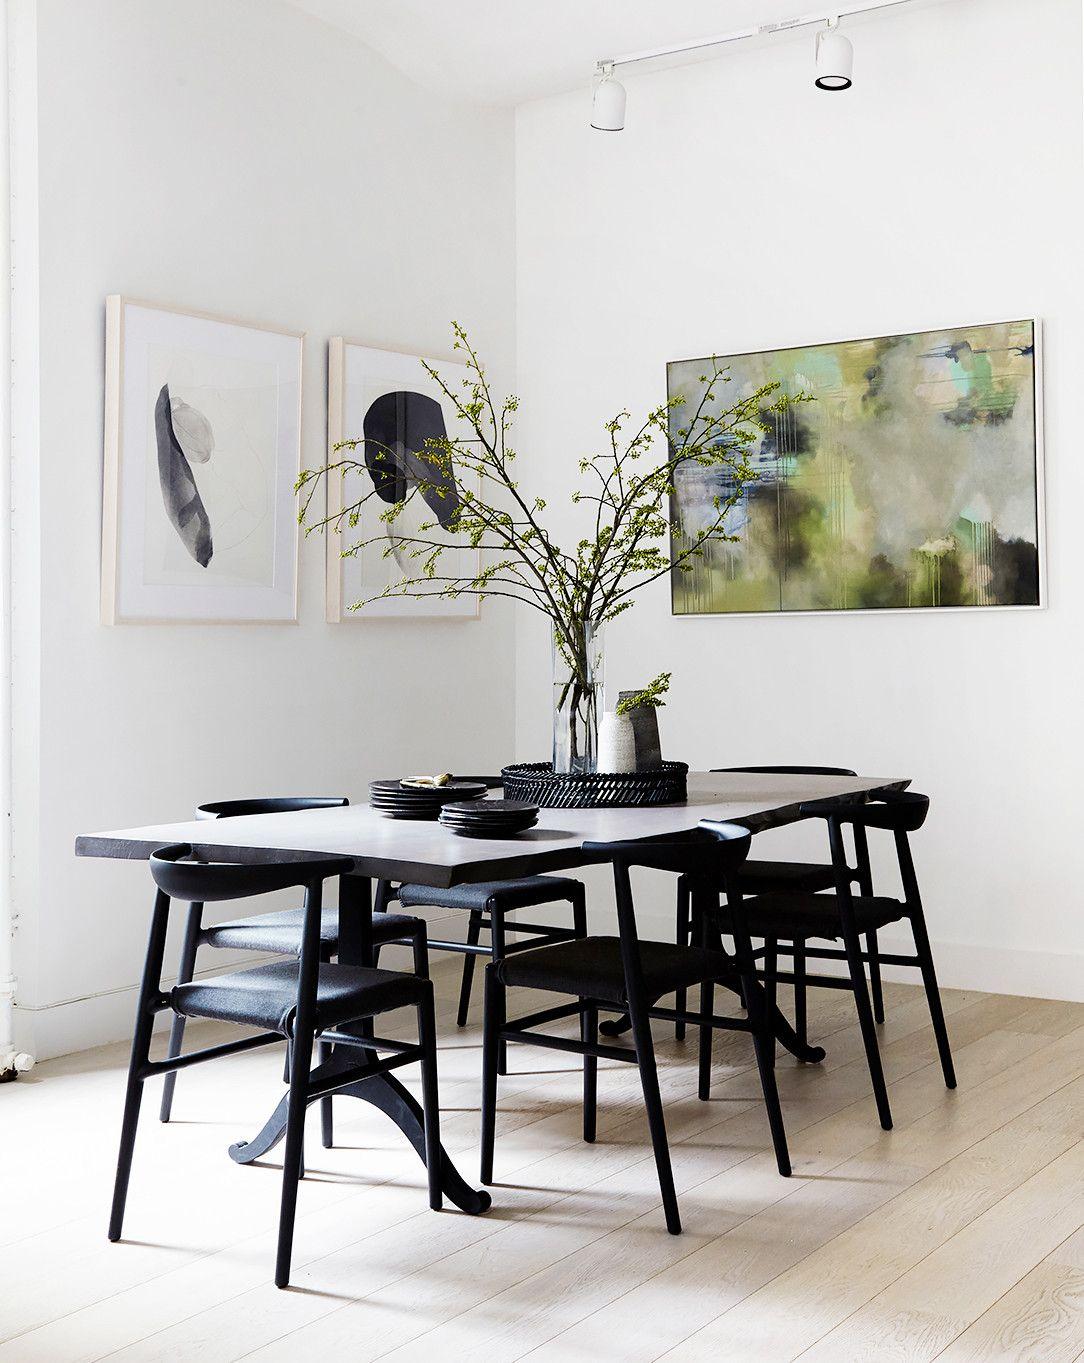 Tour An Insanely Stylish Nyc Loft With Major Scandinavian Vibes Modern Scandinavian Interior Scandinavian Dining Room Scandinavian Interior Design